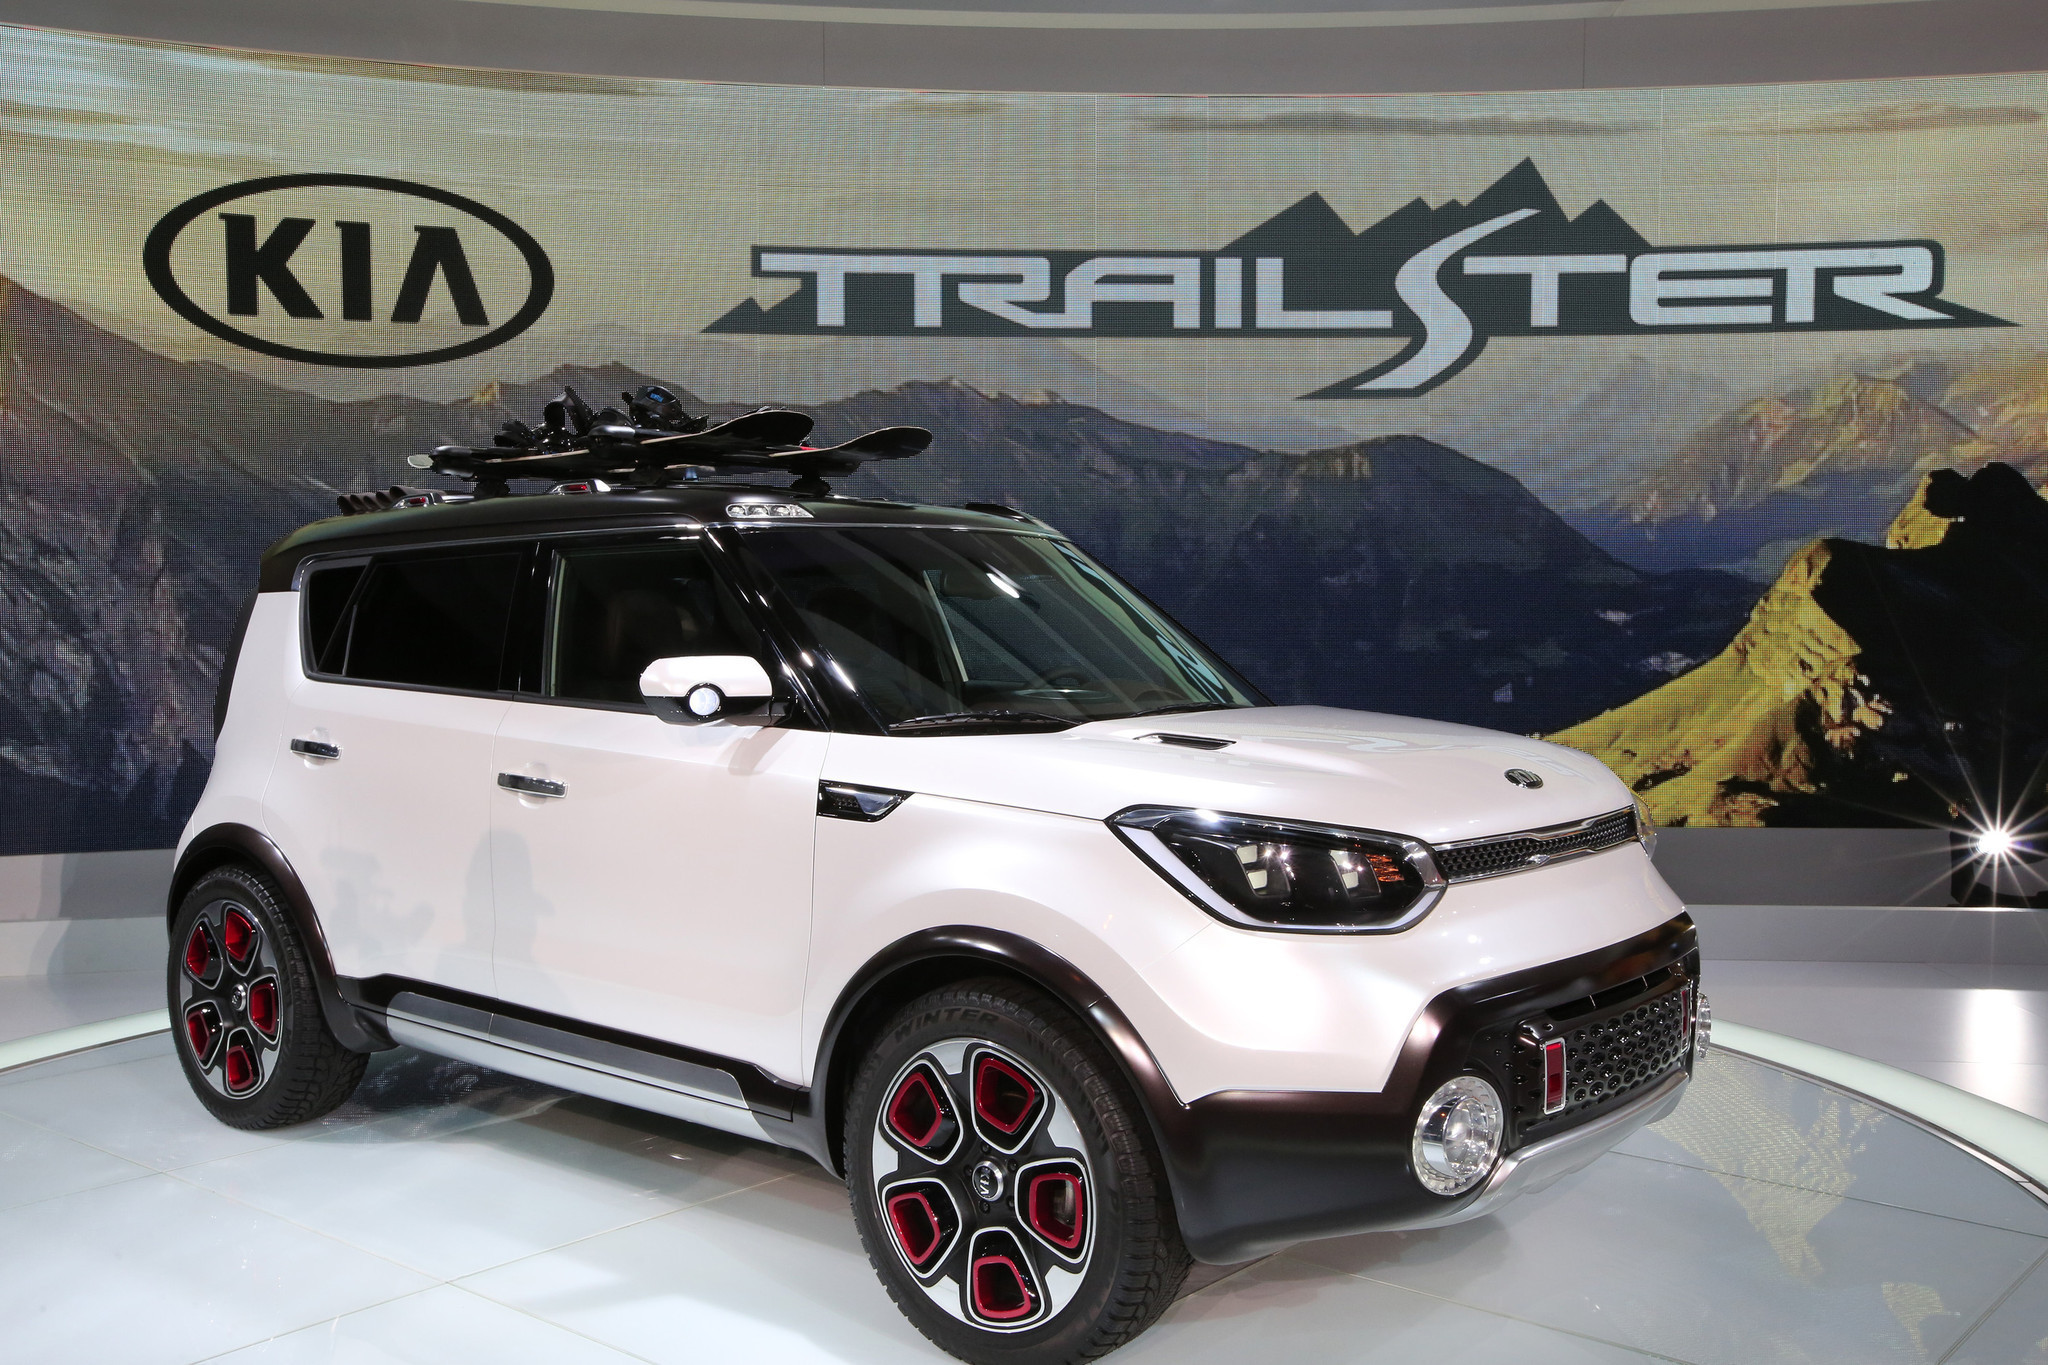 kia announces trailster e awd concept for chicago auto show car. Black Bedroom Furniture Sets. Home Design Ideas